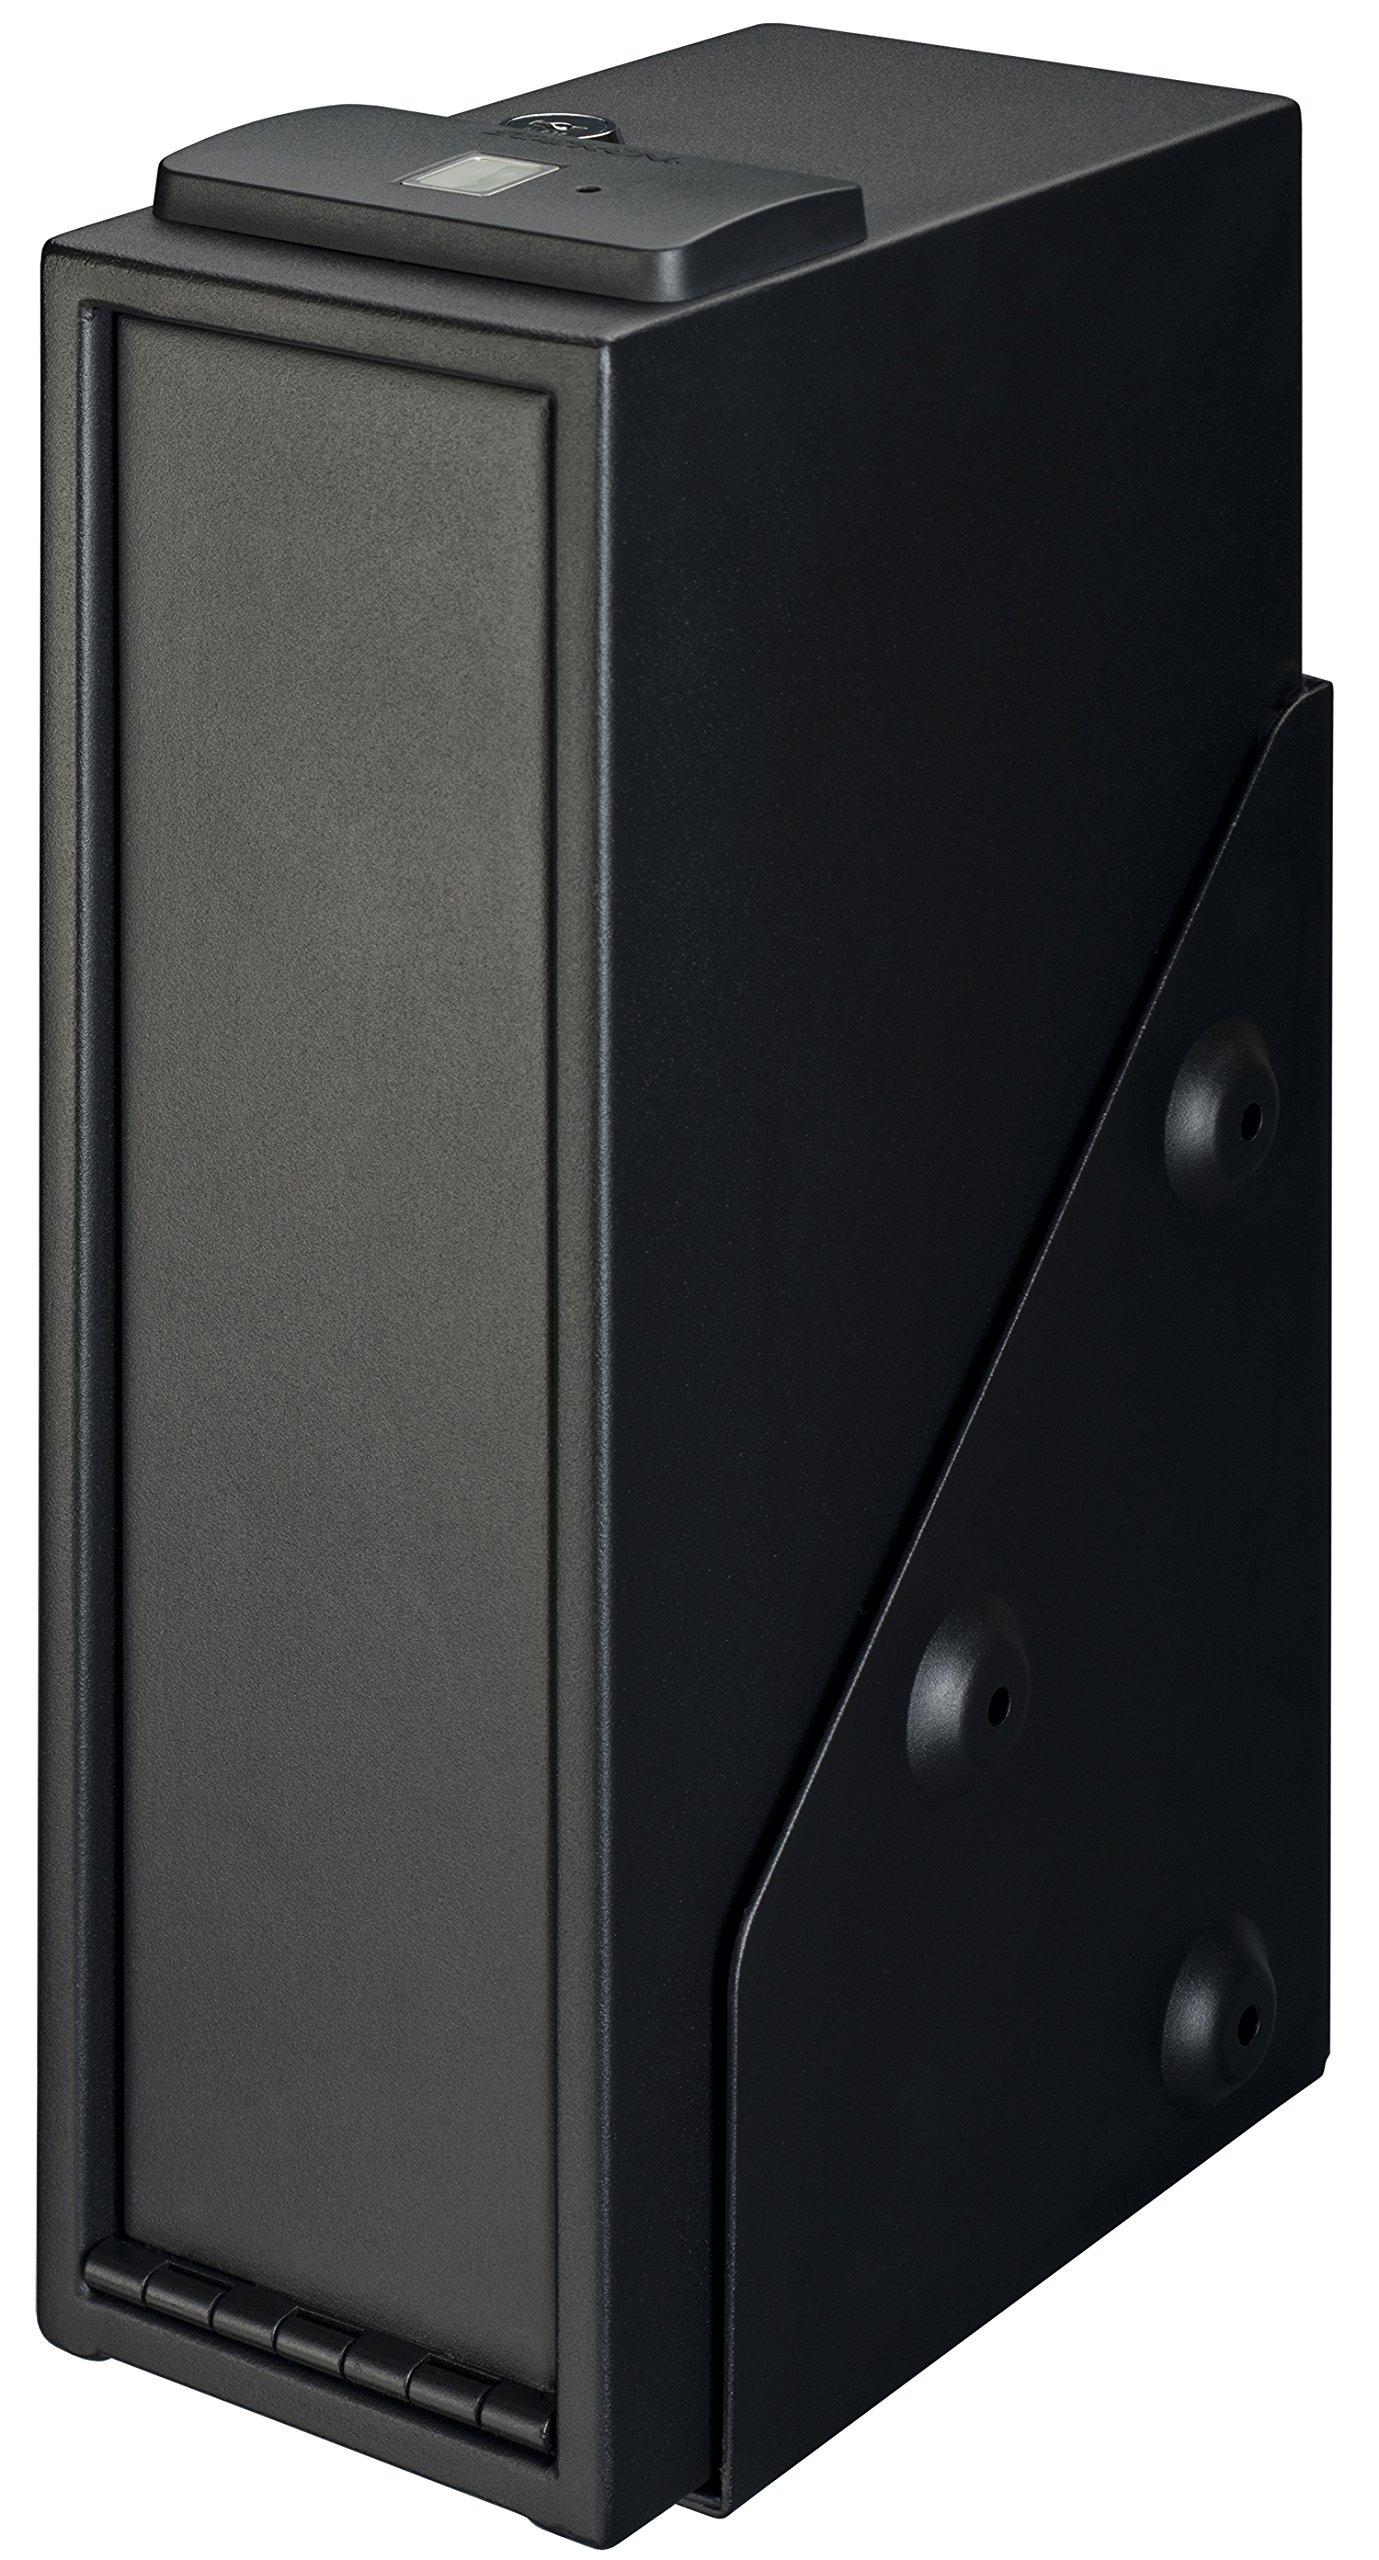 Stack-On QAS-1514-B Quick Access Single Gun Safe with Biometric Lock